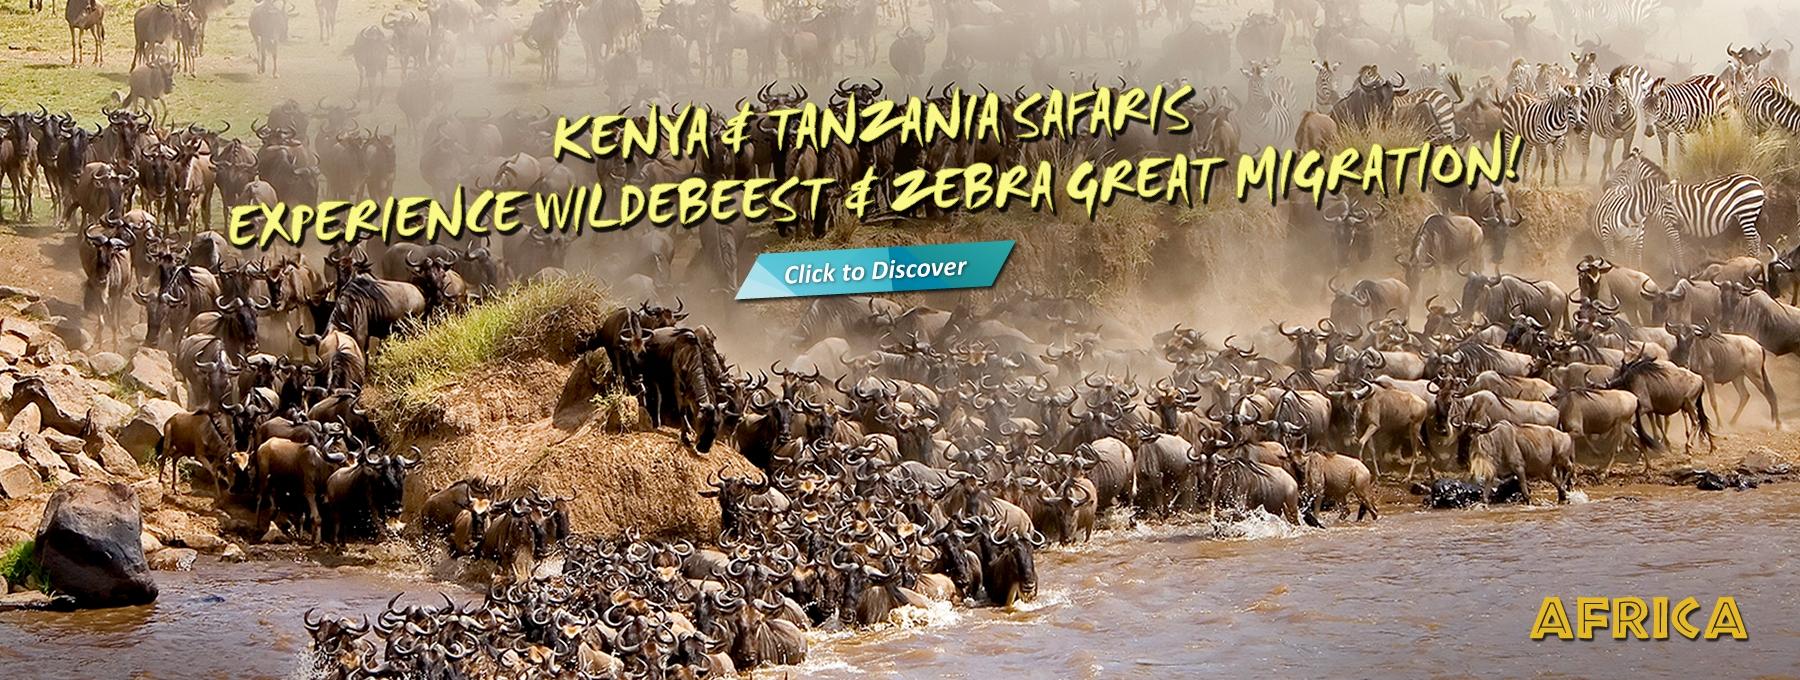 Kenya & Tanzania Safaris (East Africa)